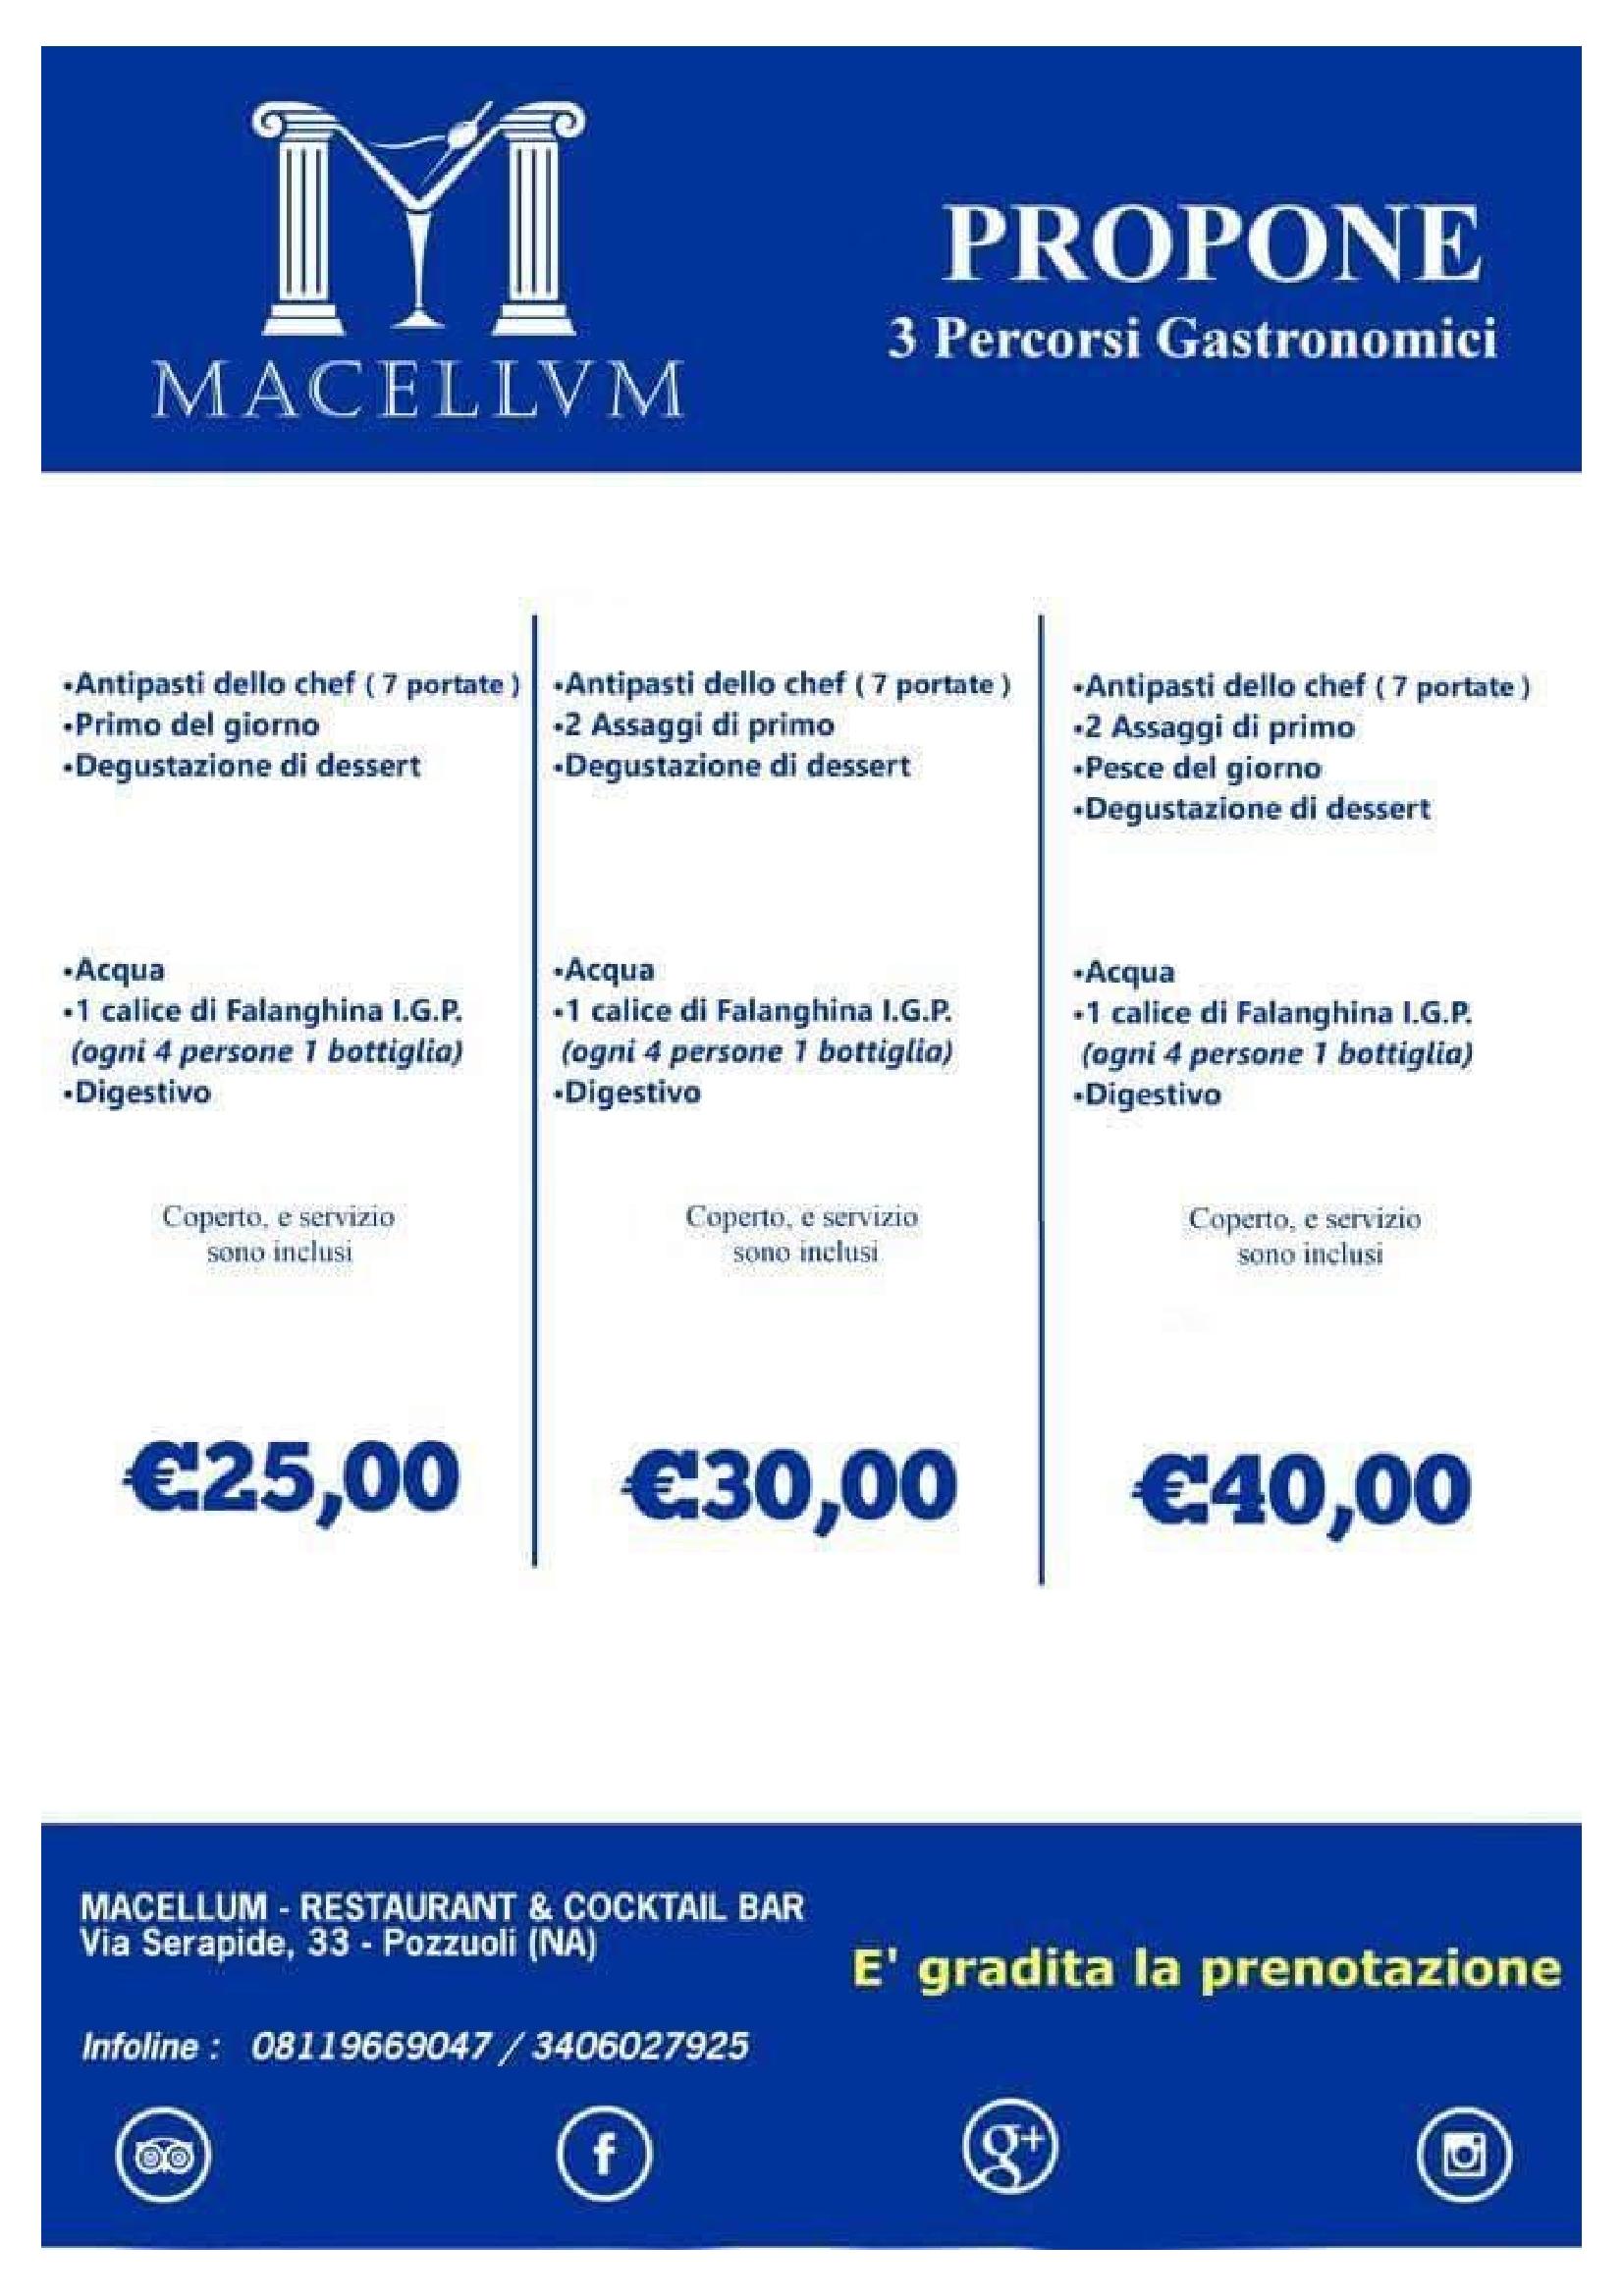 Macellum Restaurant Pozzuoli menù 1 pagina